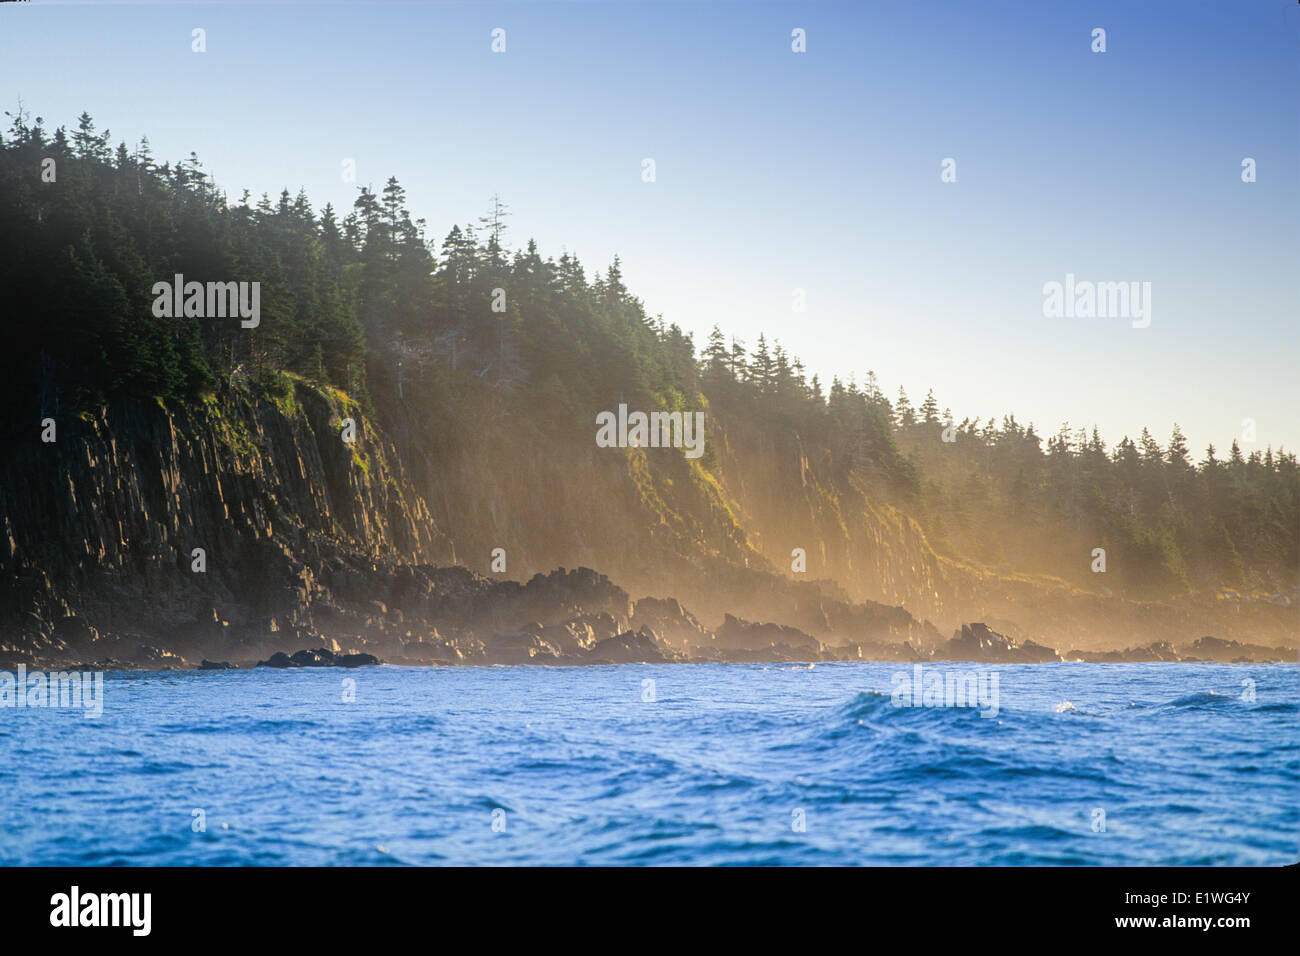 Witless Bay Ecological Reserve, Newfoundland, Canada - Stock Image